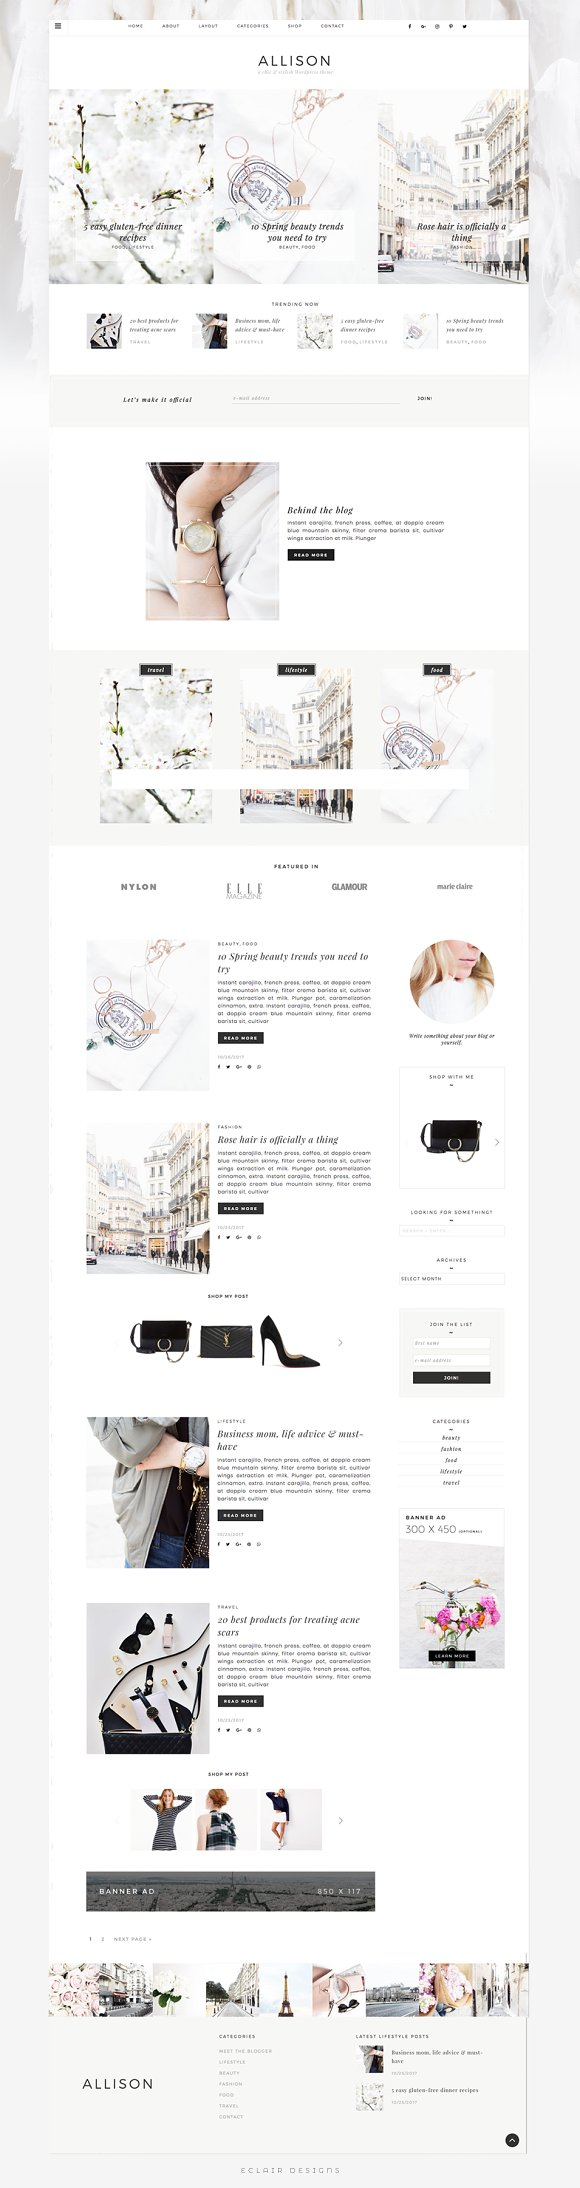 Allison - Wordpress Theme